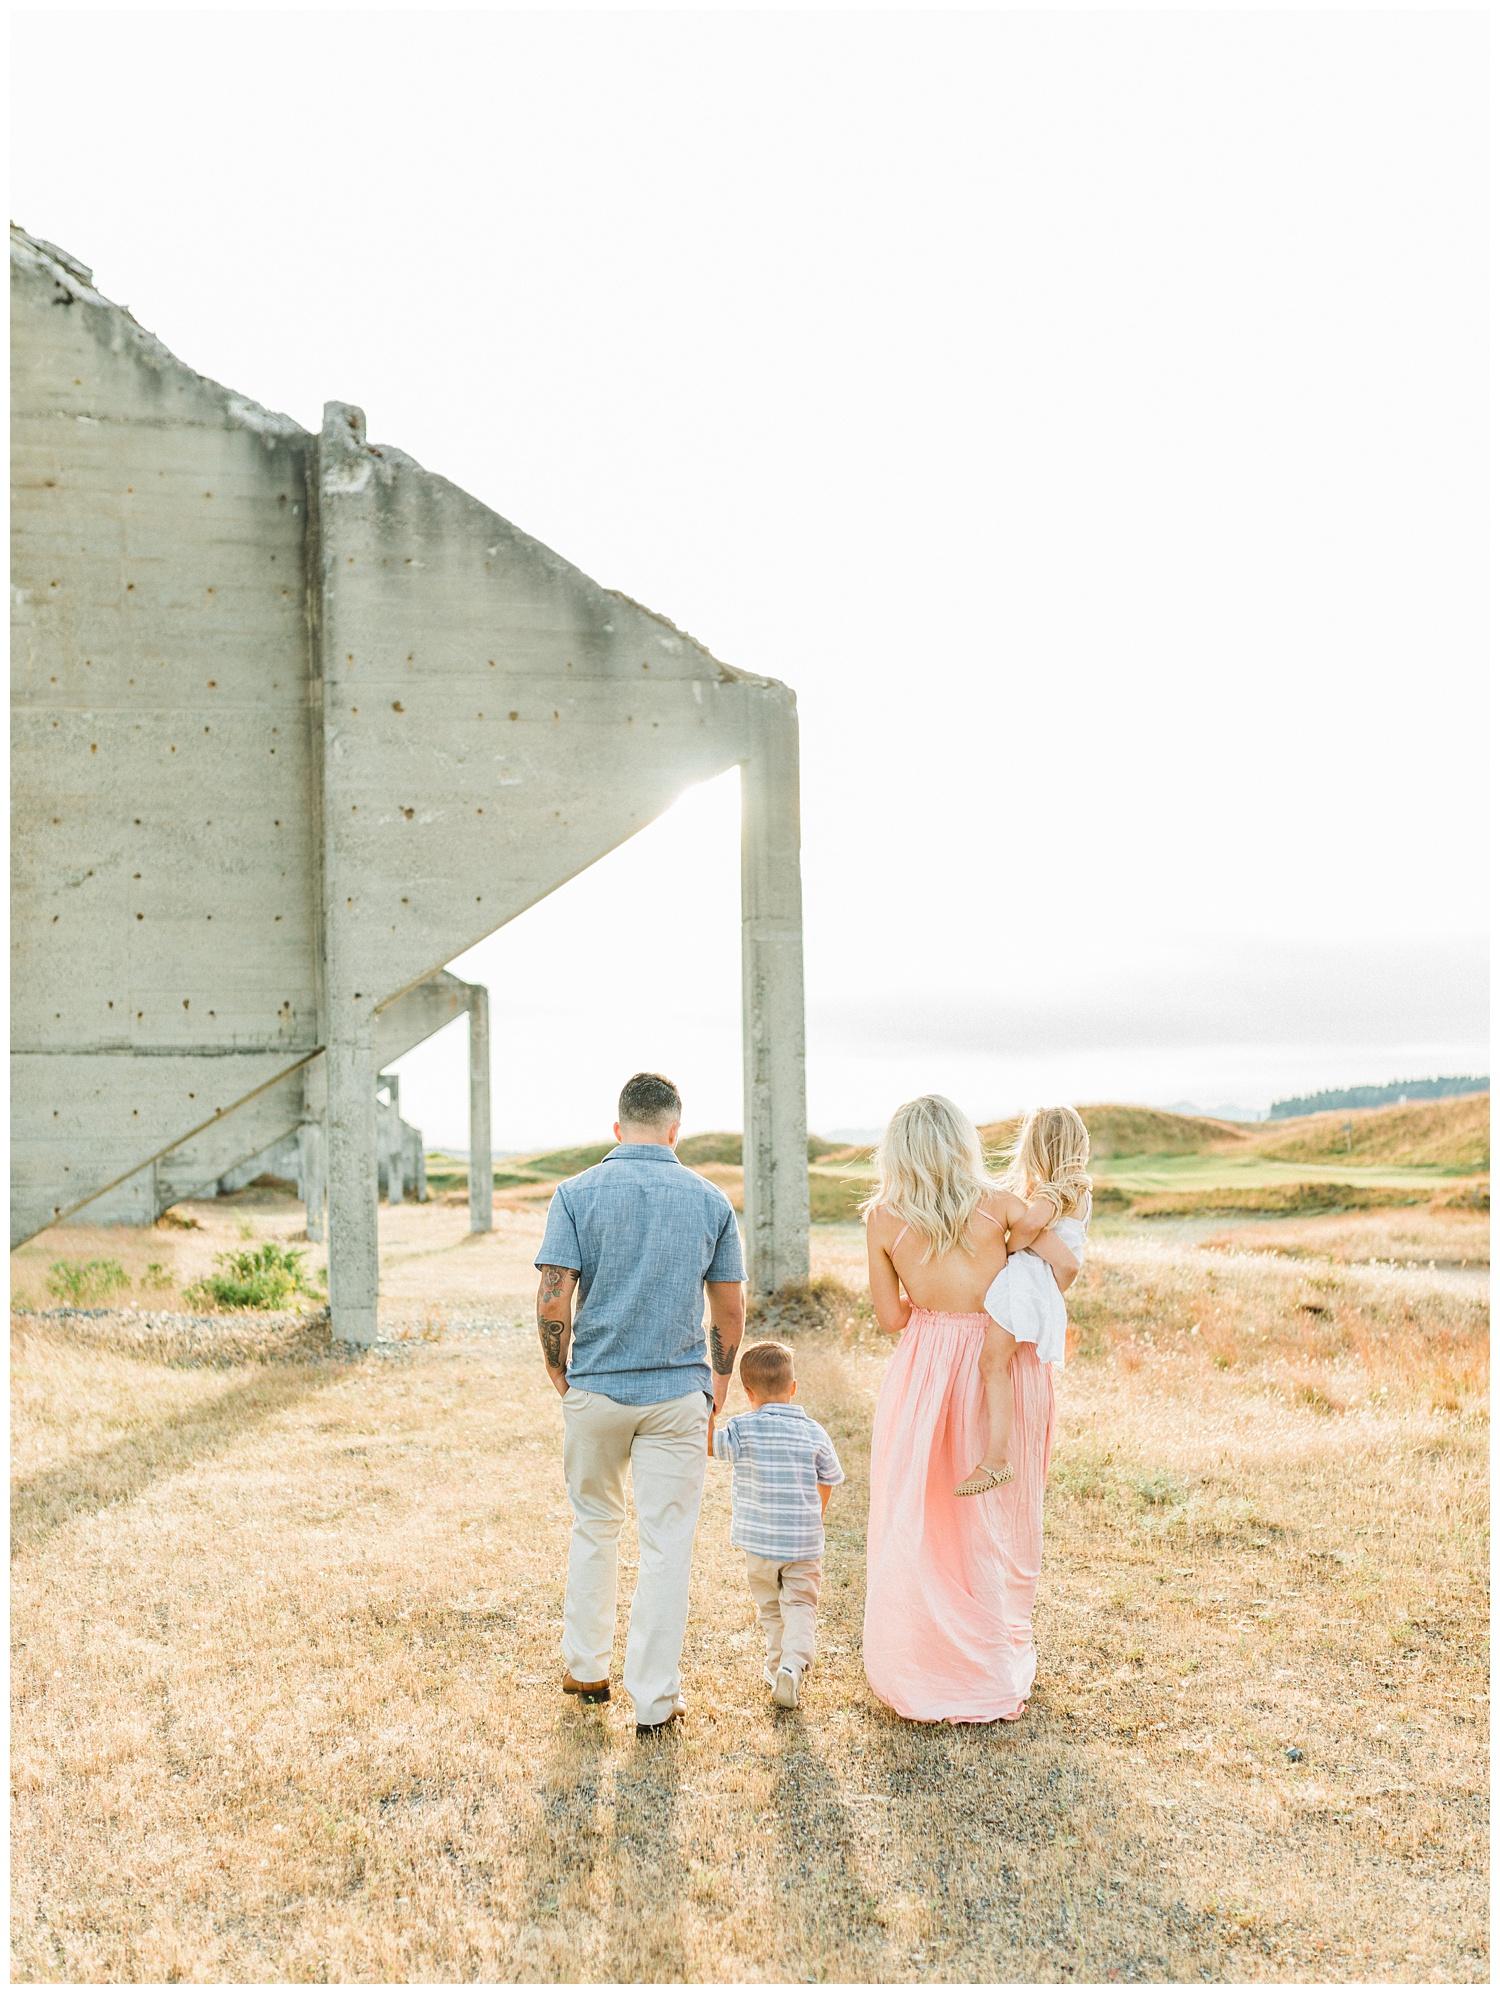 washginton-family-photographer_041.jpg